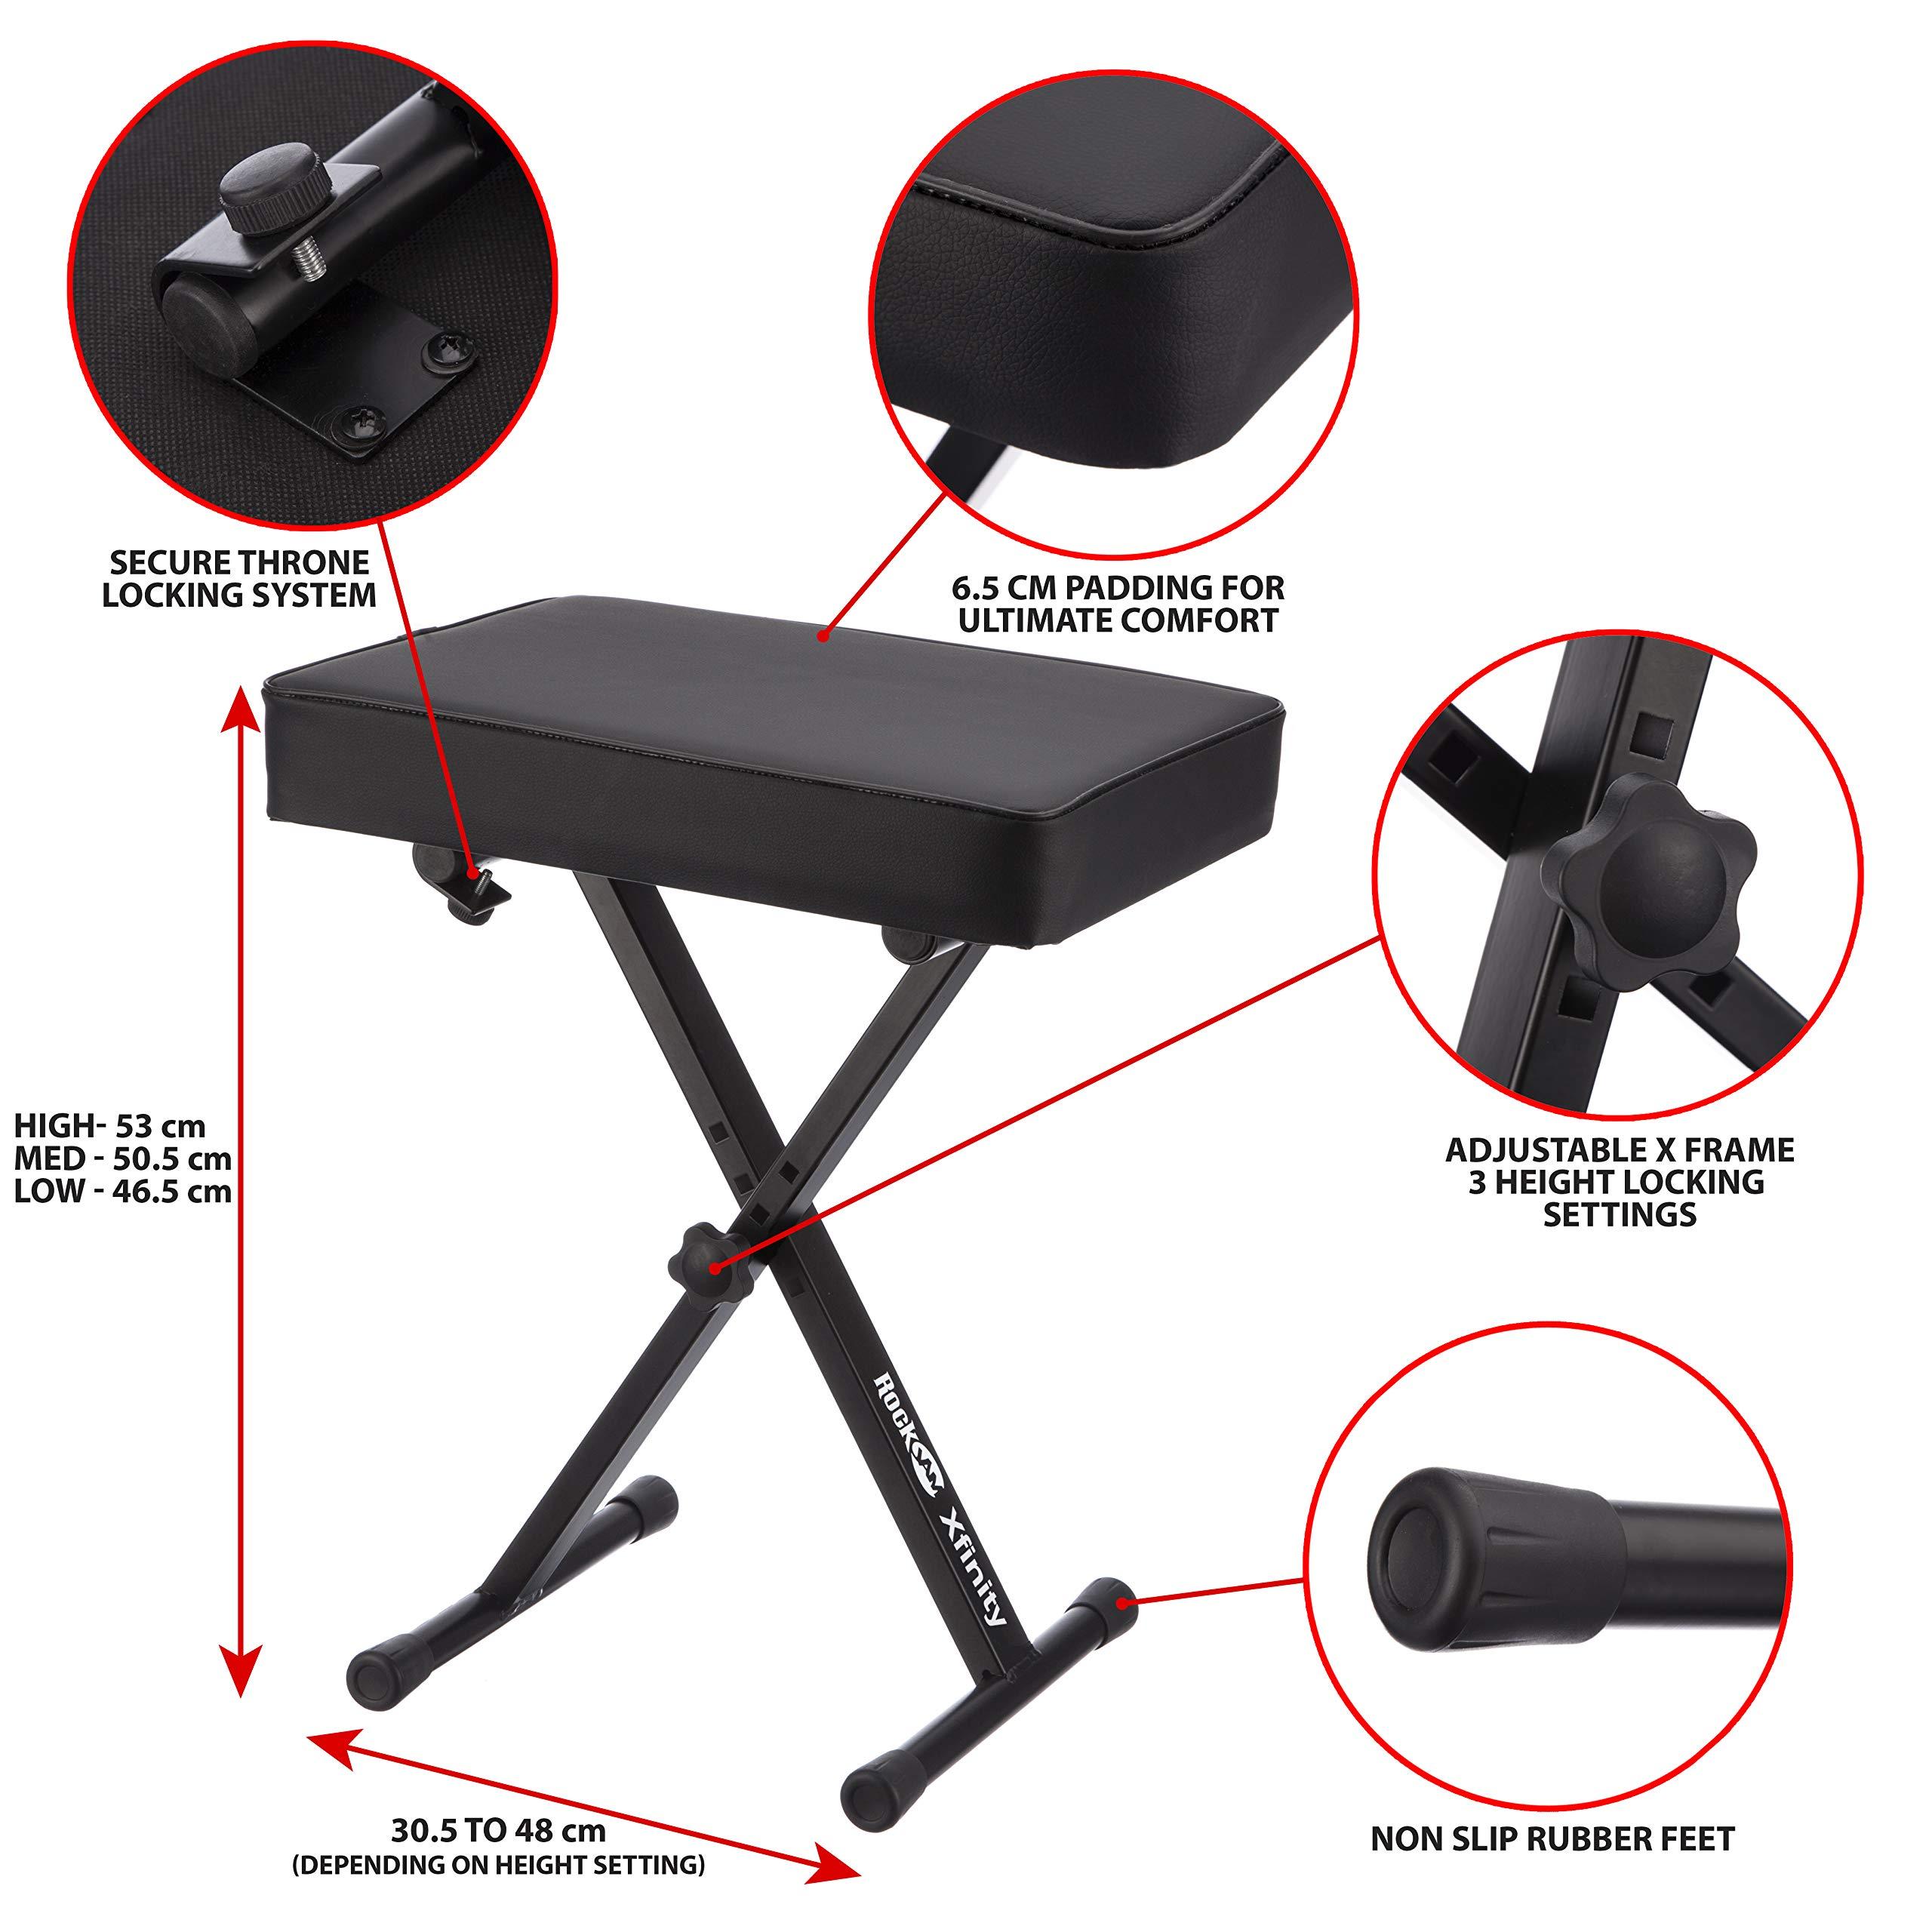 RockJam KB100 Adjustable Padded Keyboard Bench, X-Style, Black by RockJam